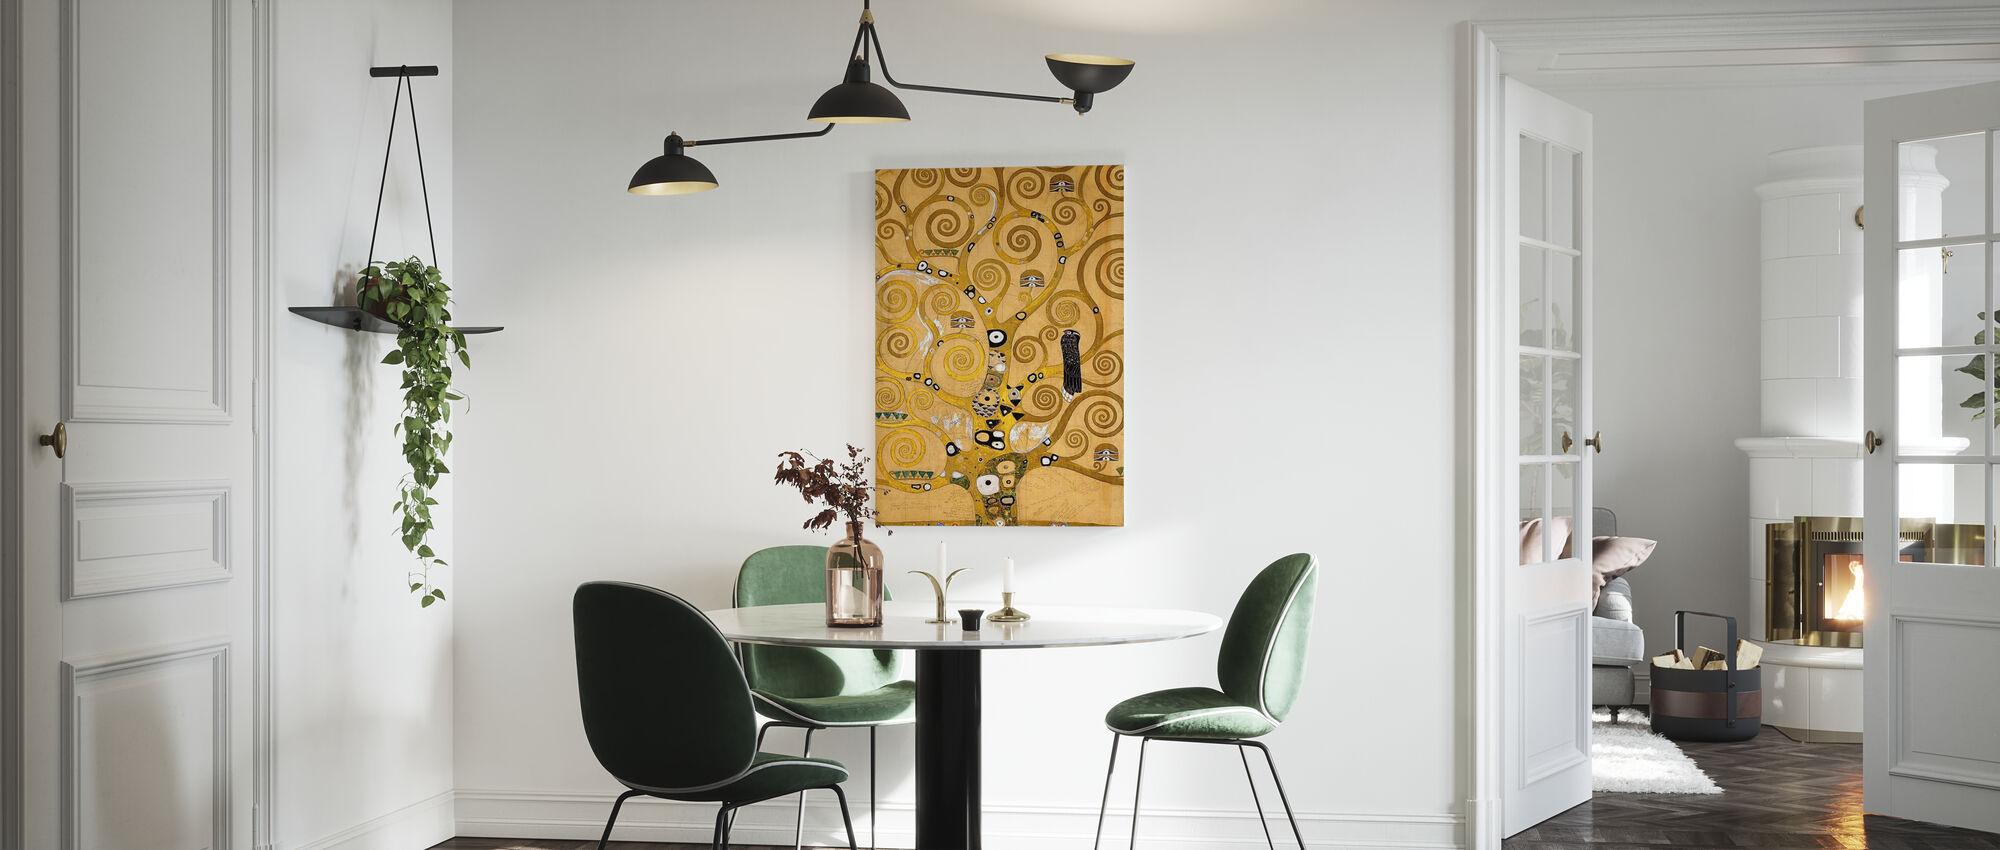 Klimt, Gustav - The Tree of Life - Canvas print - Kitchen